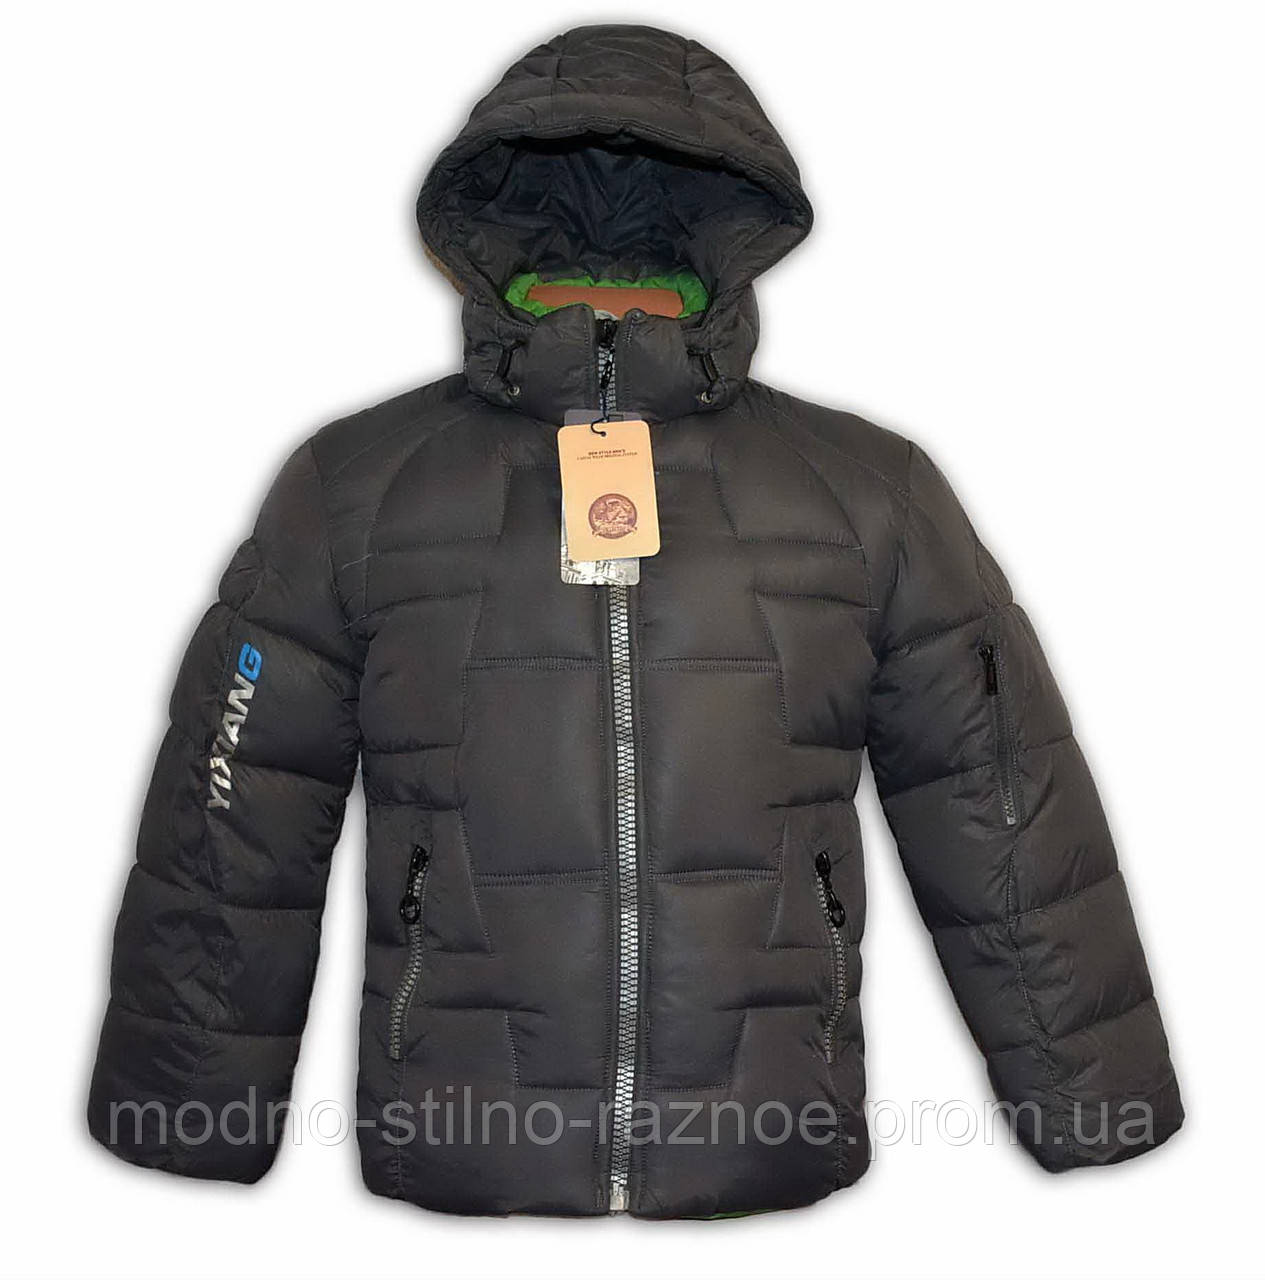 Куртка зимняя на мальчика Рост 146-152